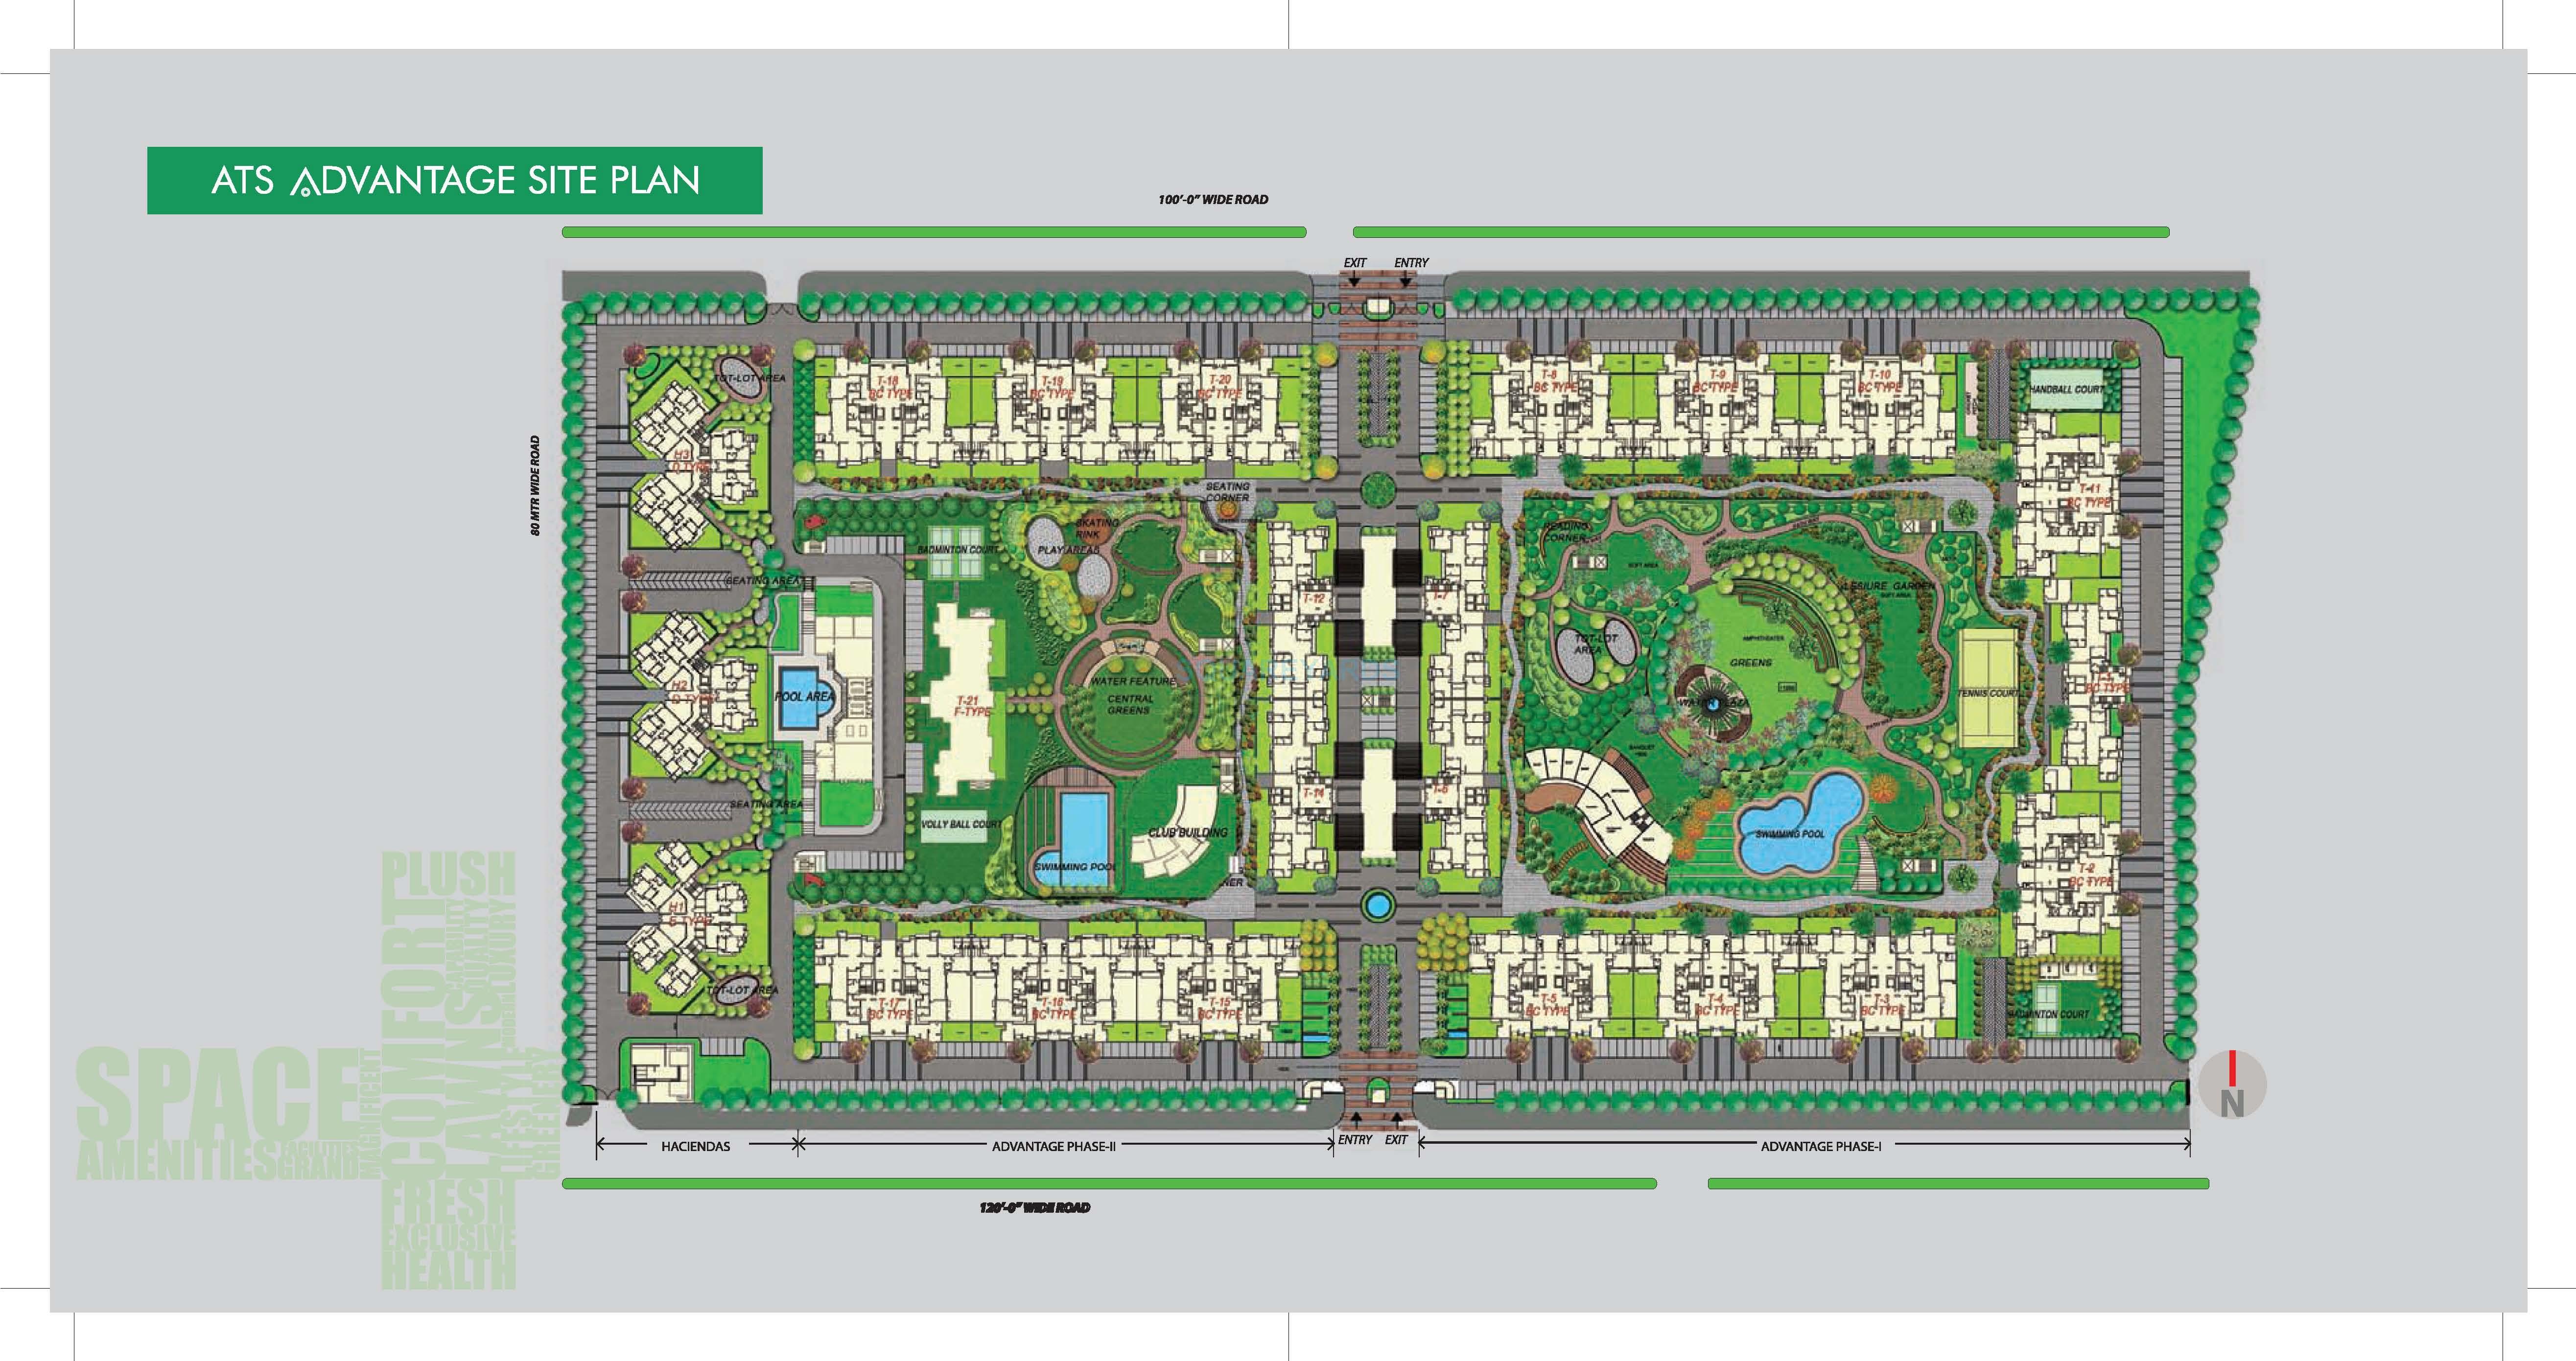 ats advantage phase ii master plan image1